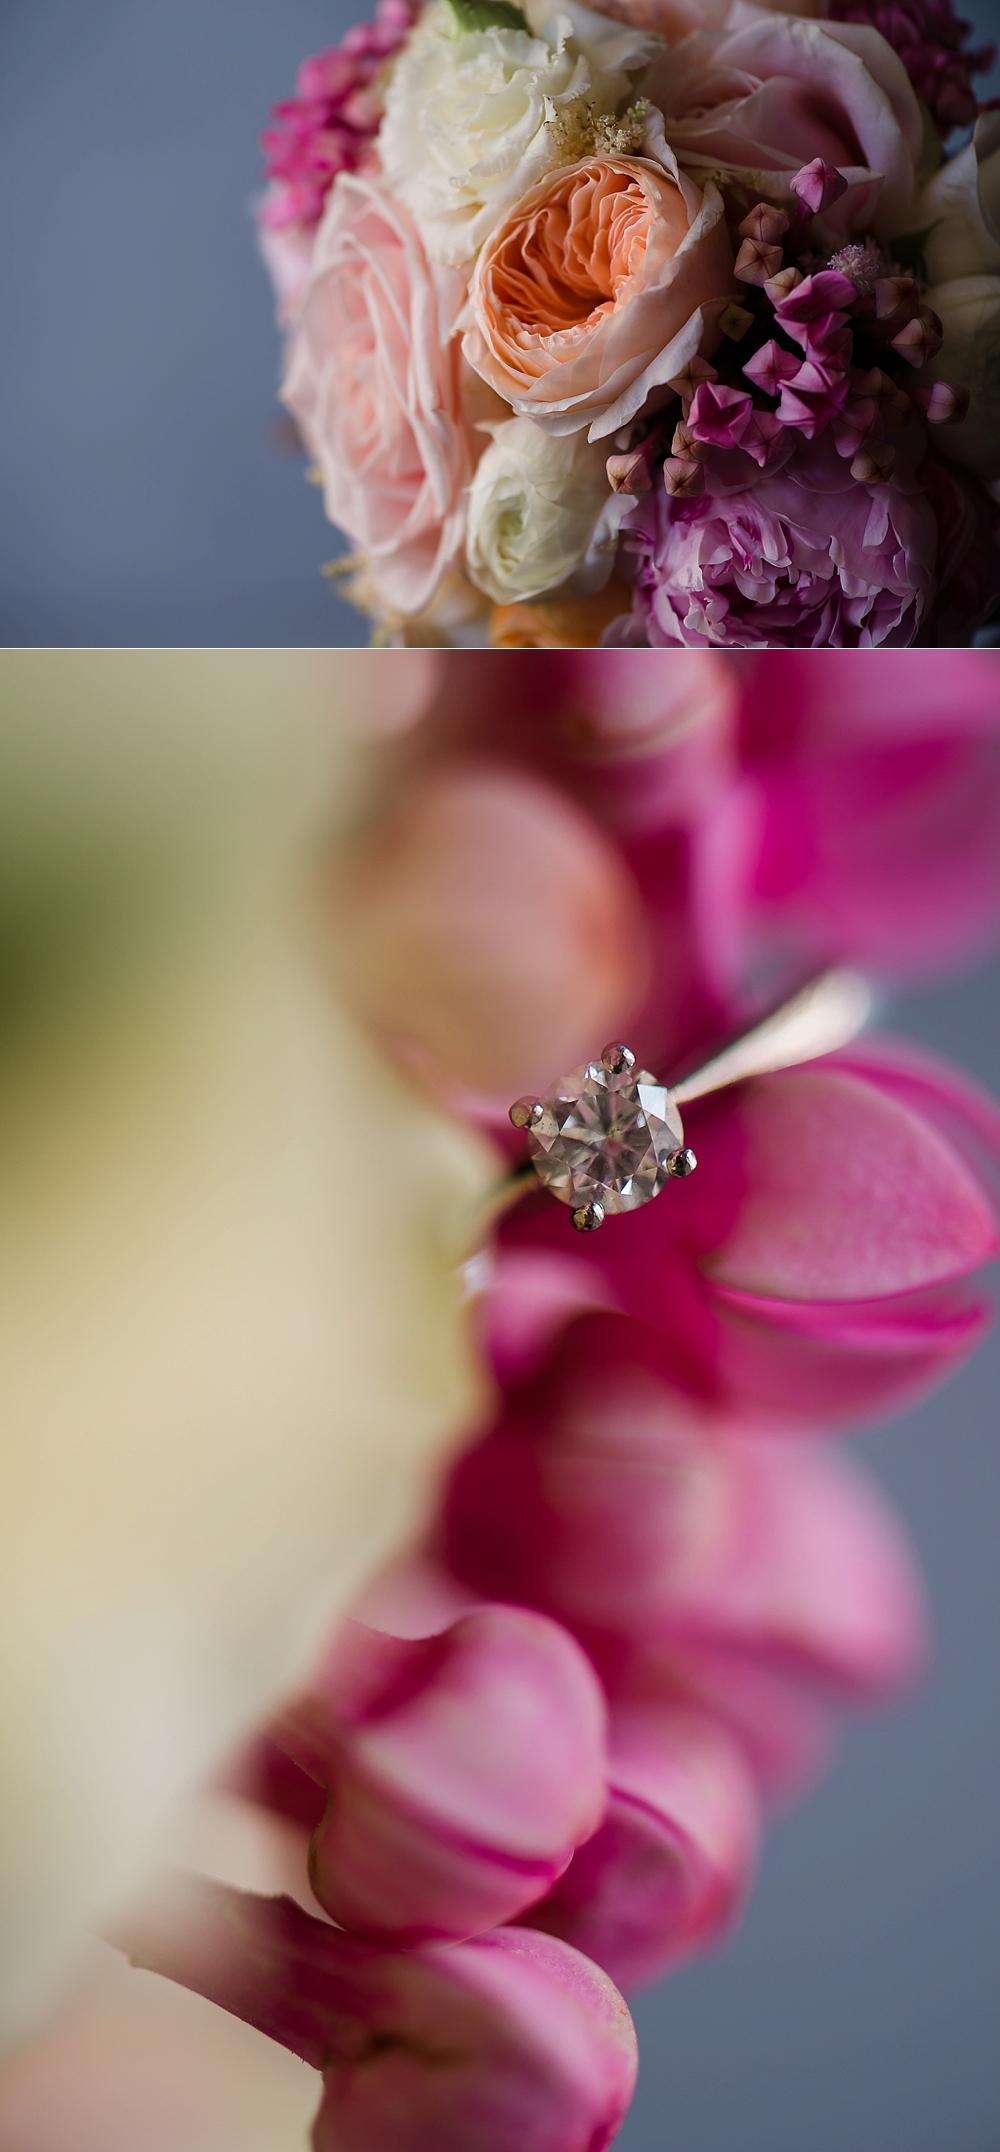 Kristina & Thomas - Villa Arrigo - Wedding PhotograpKristina & Thomas - Villa Arrigo - Wedding Photography Malta - Shane P. Wattshy Malta - Shane P. Watts